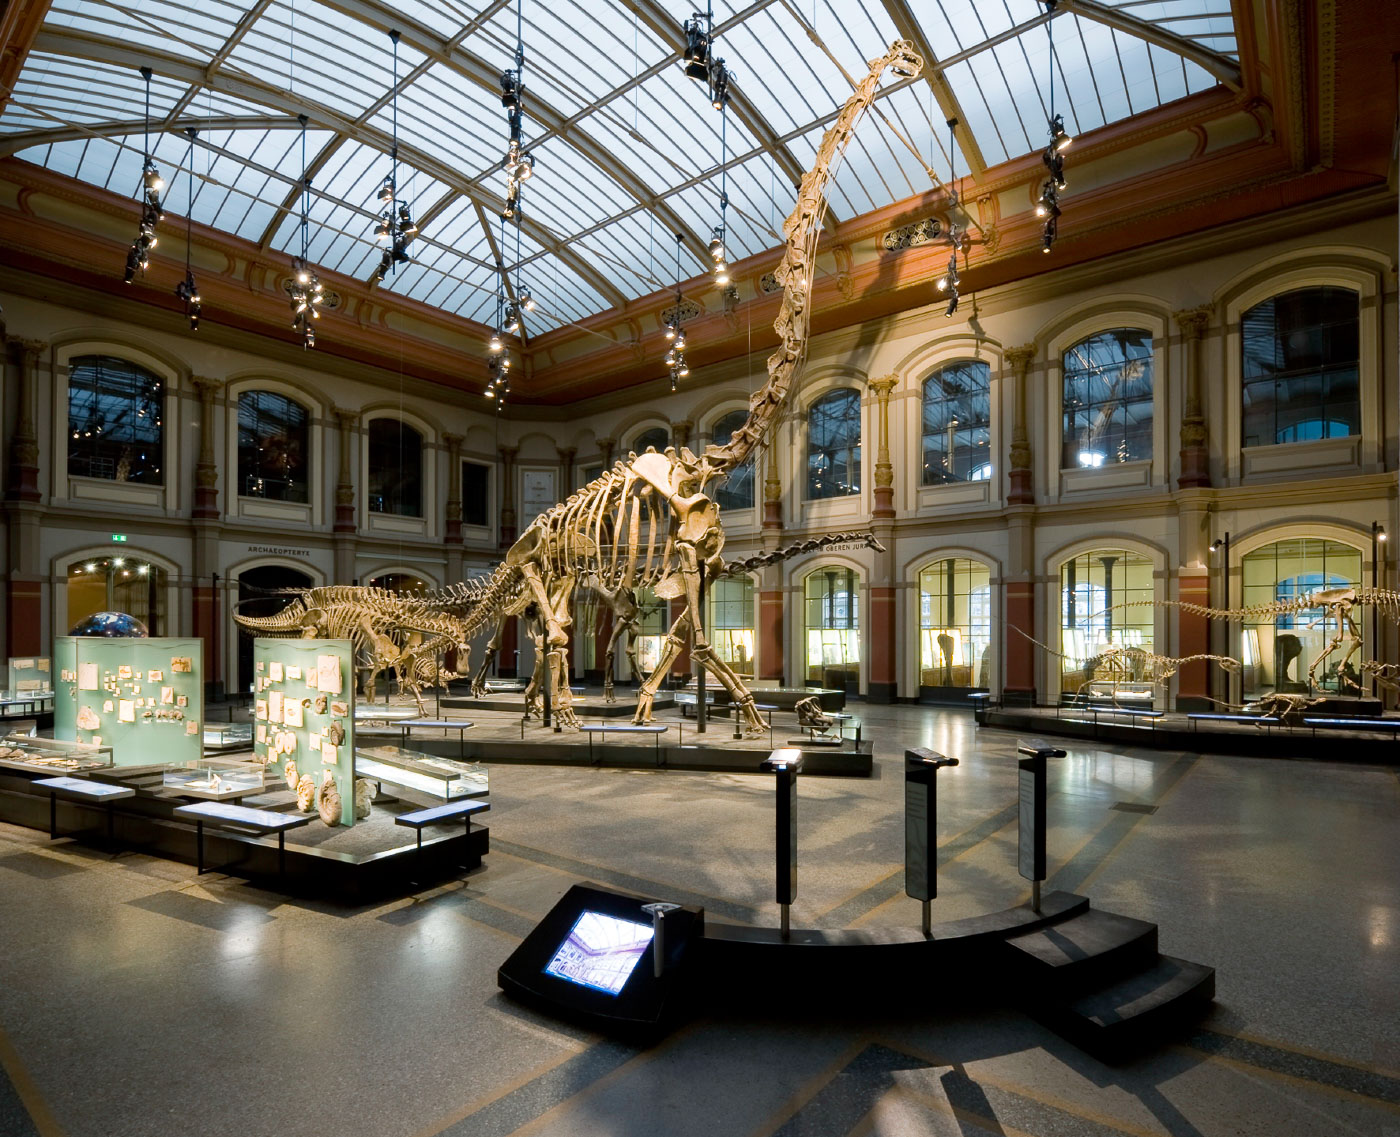 Foto: Antje Dittmann - Museum für Naturkunde Berlin